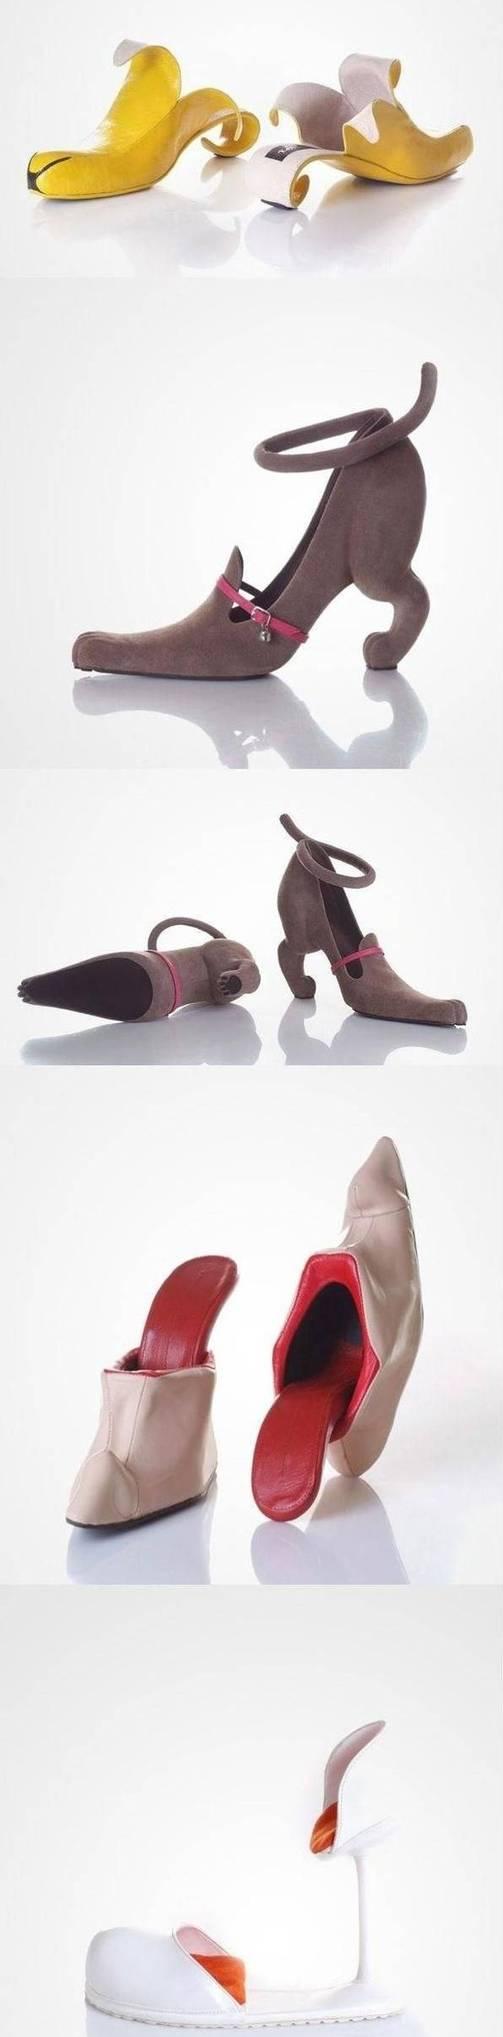 sepatu high heels yang unik (4)